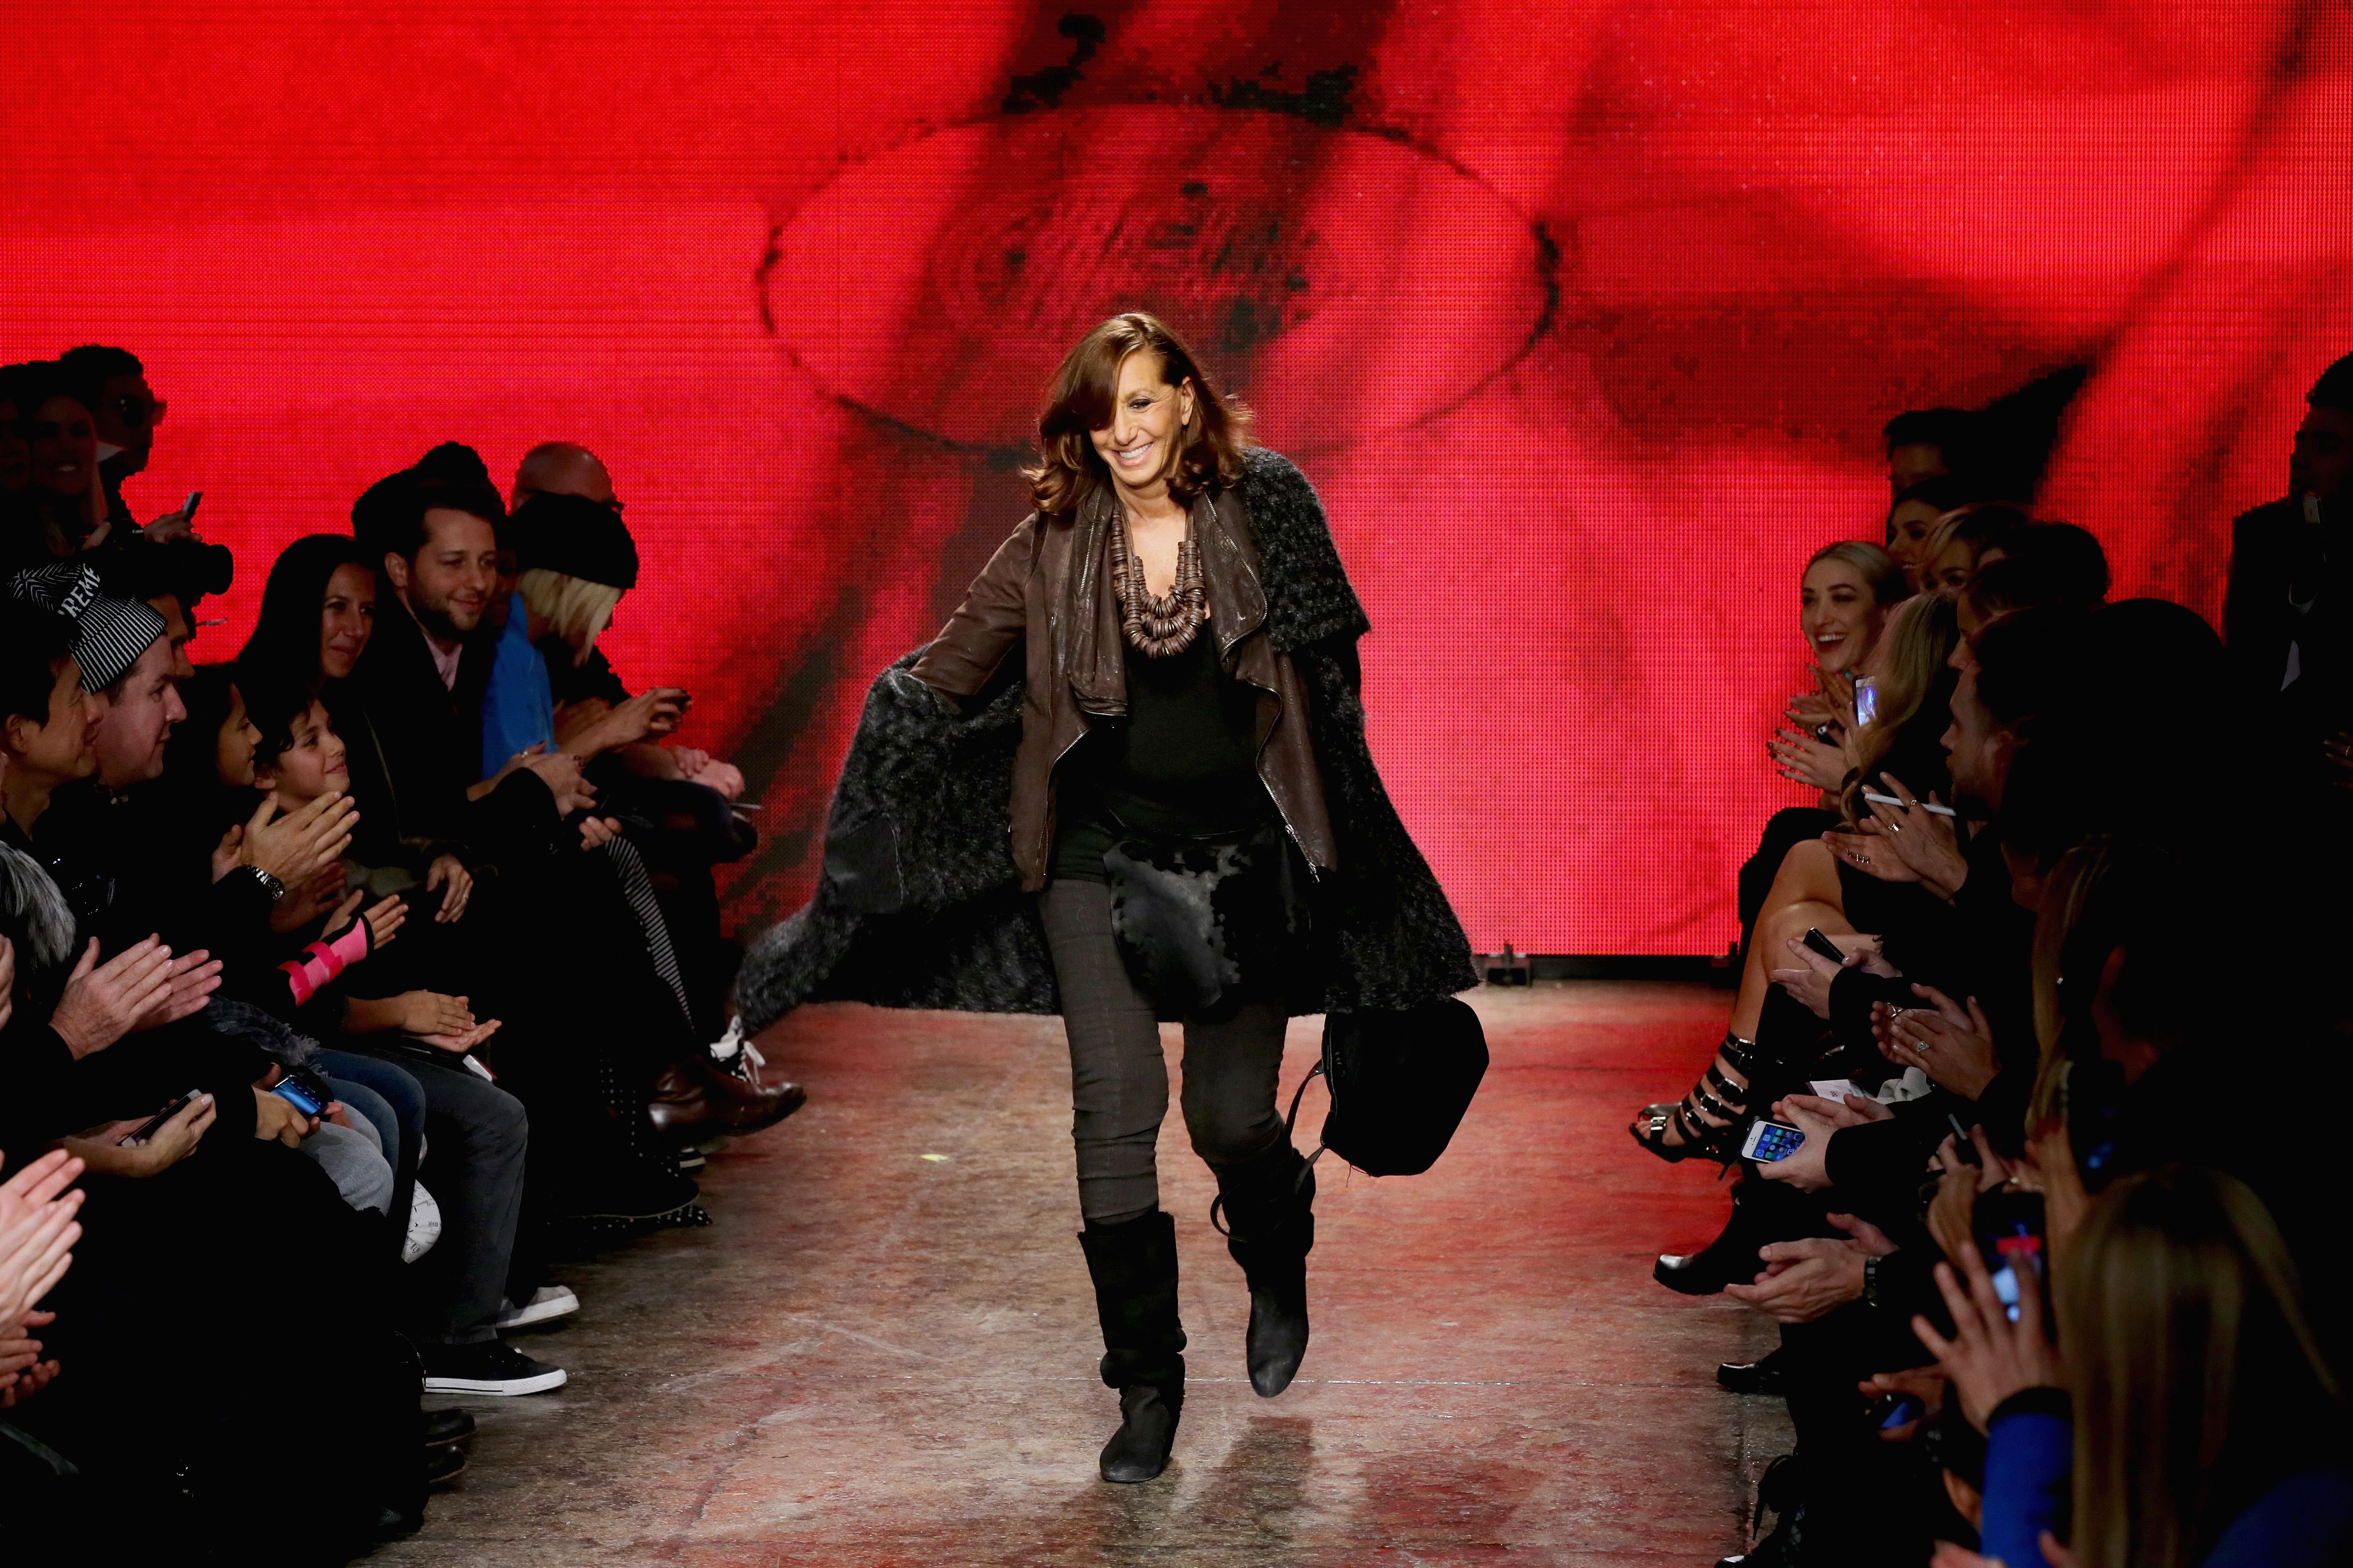 Donna Karan walks the runway at the DKNY Women's fashion show. (Photo: Neilson Barnard/Getty Images)